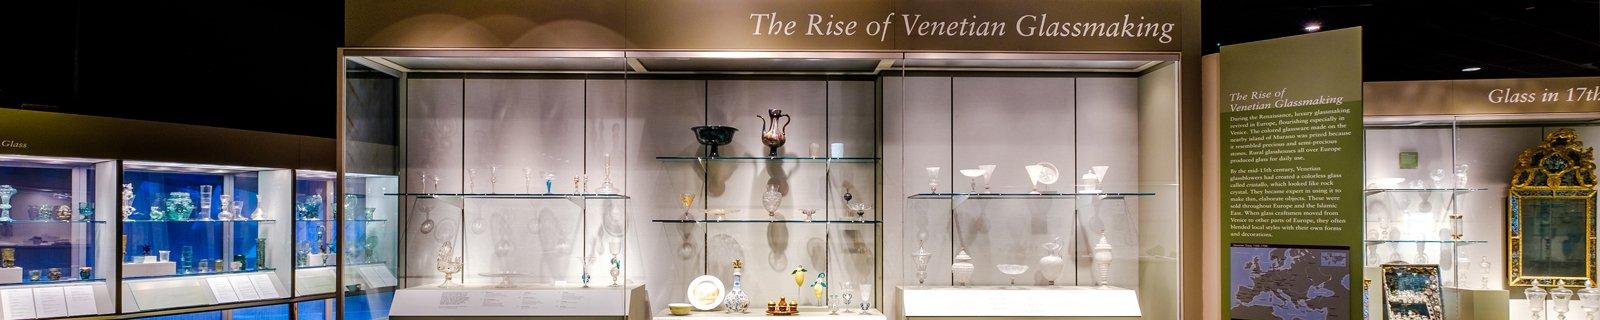 The Rise of Venetian Glassmaking